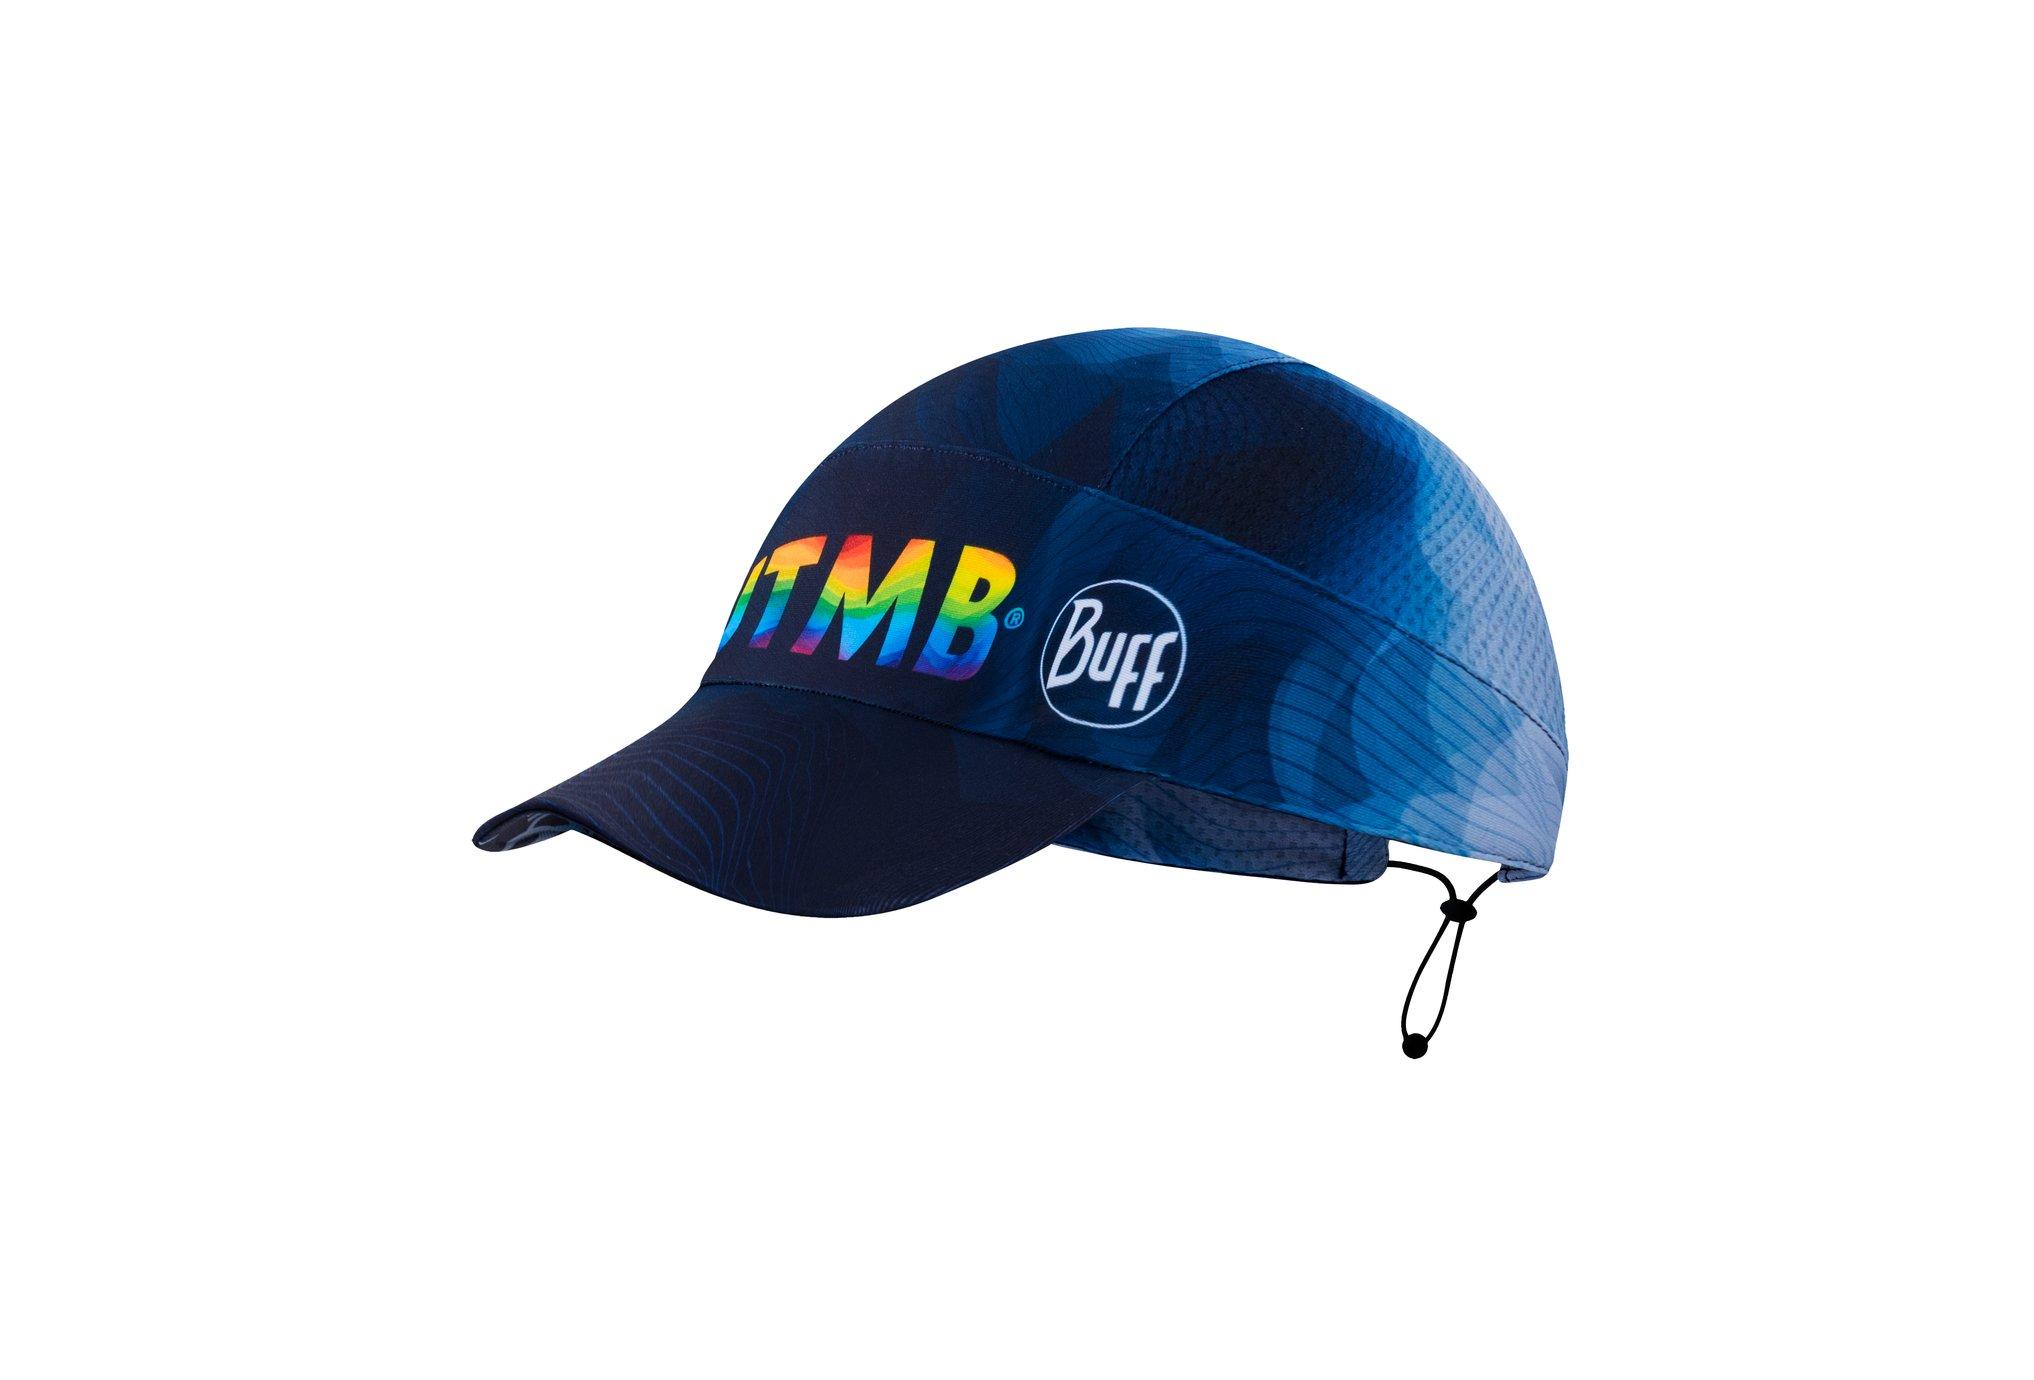 Buff Pack Run Cap UTMB® Casquettes / bandeaux